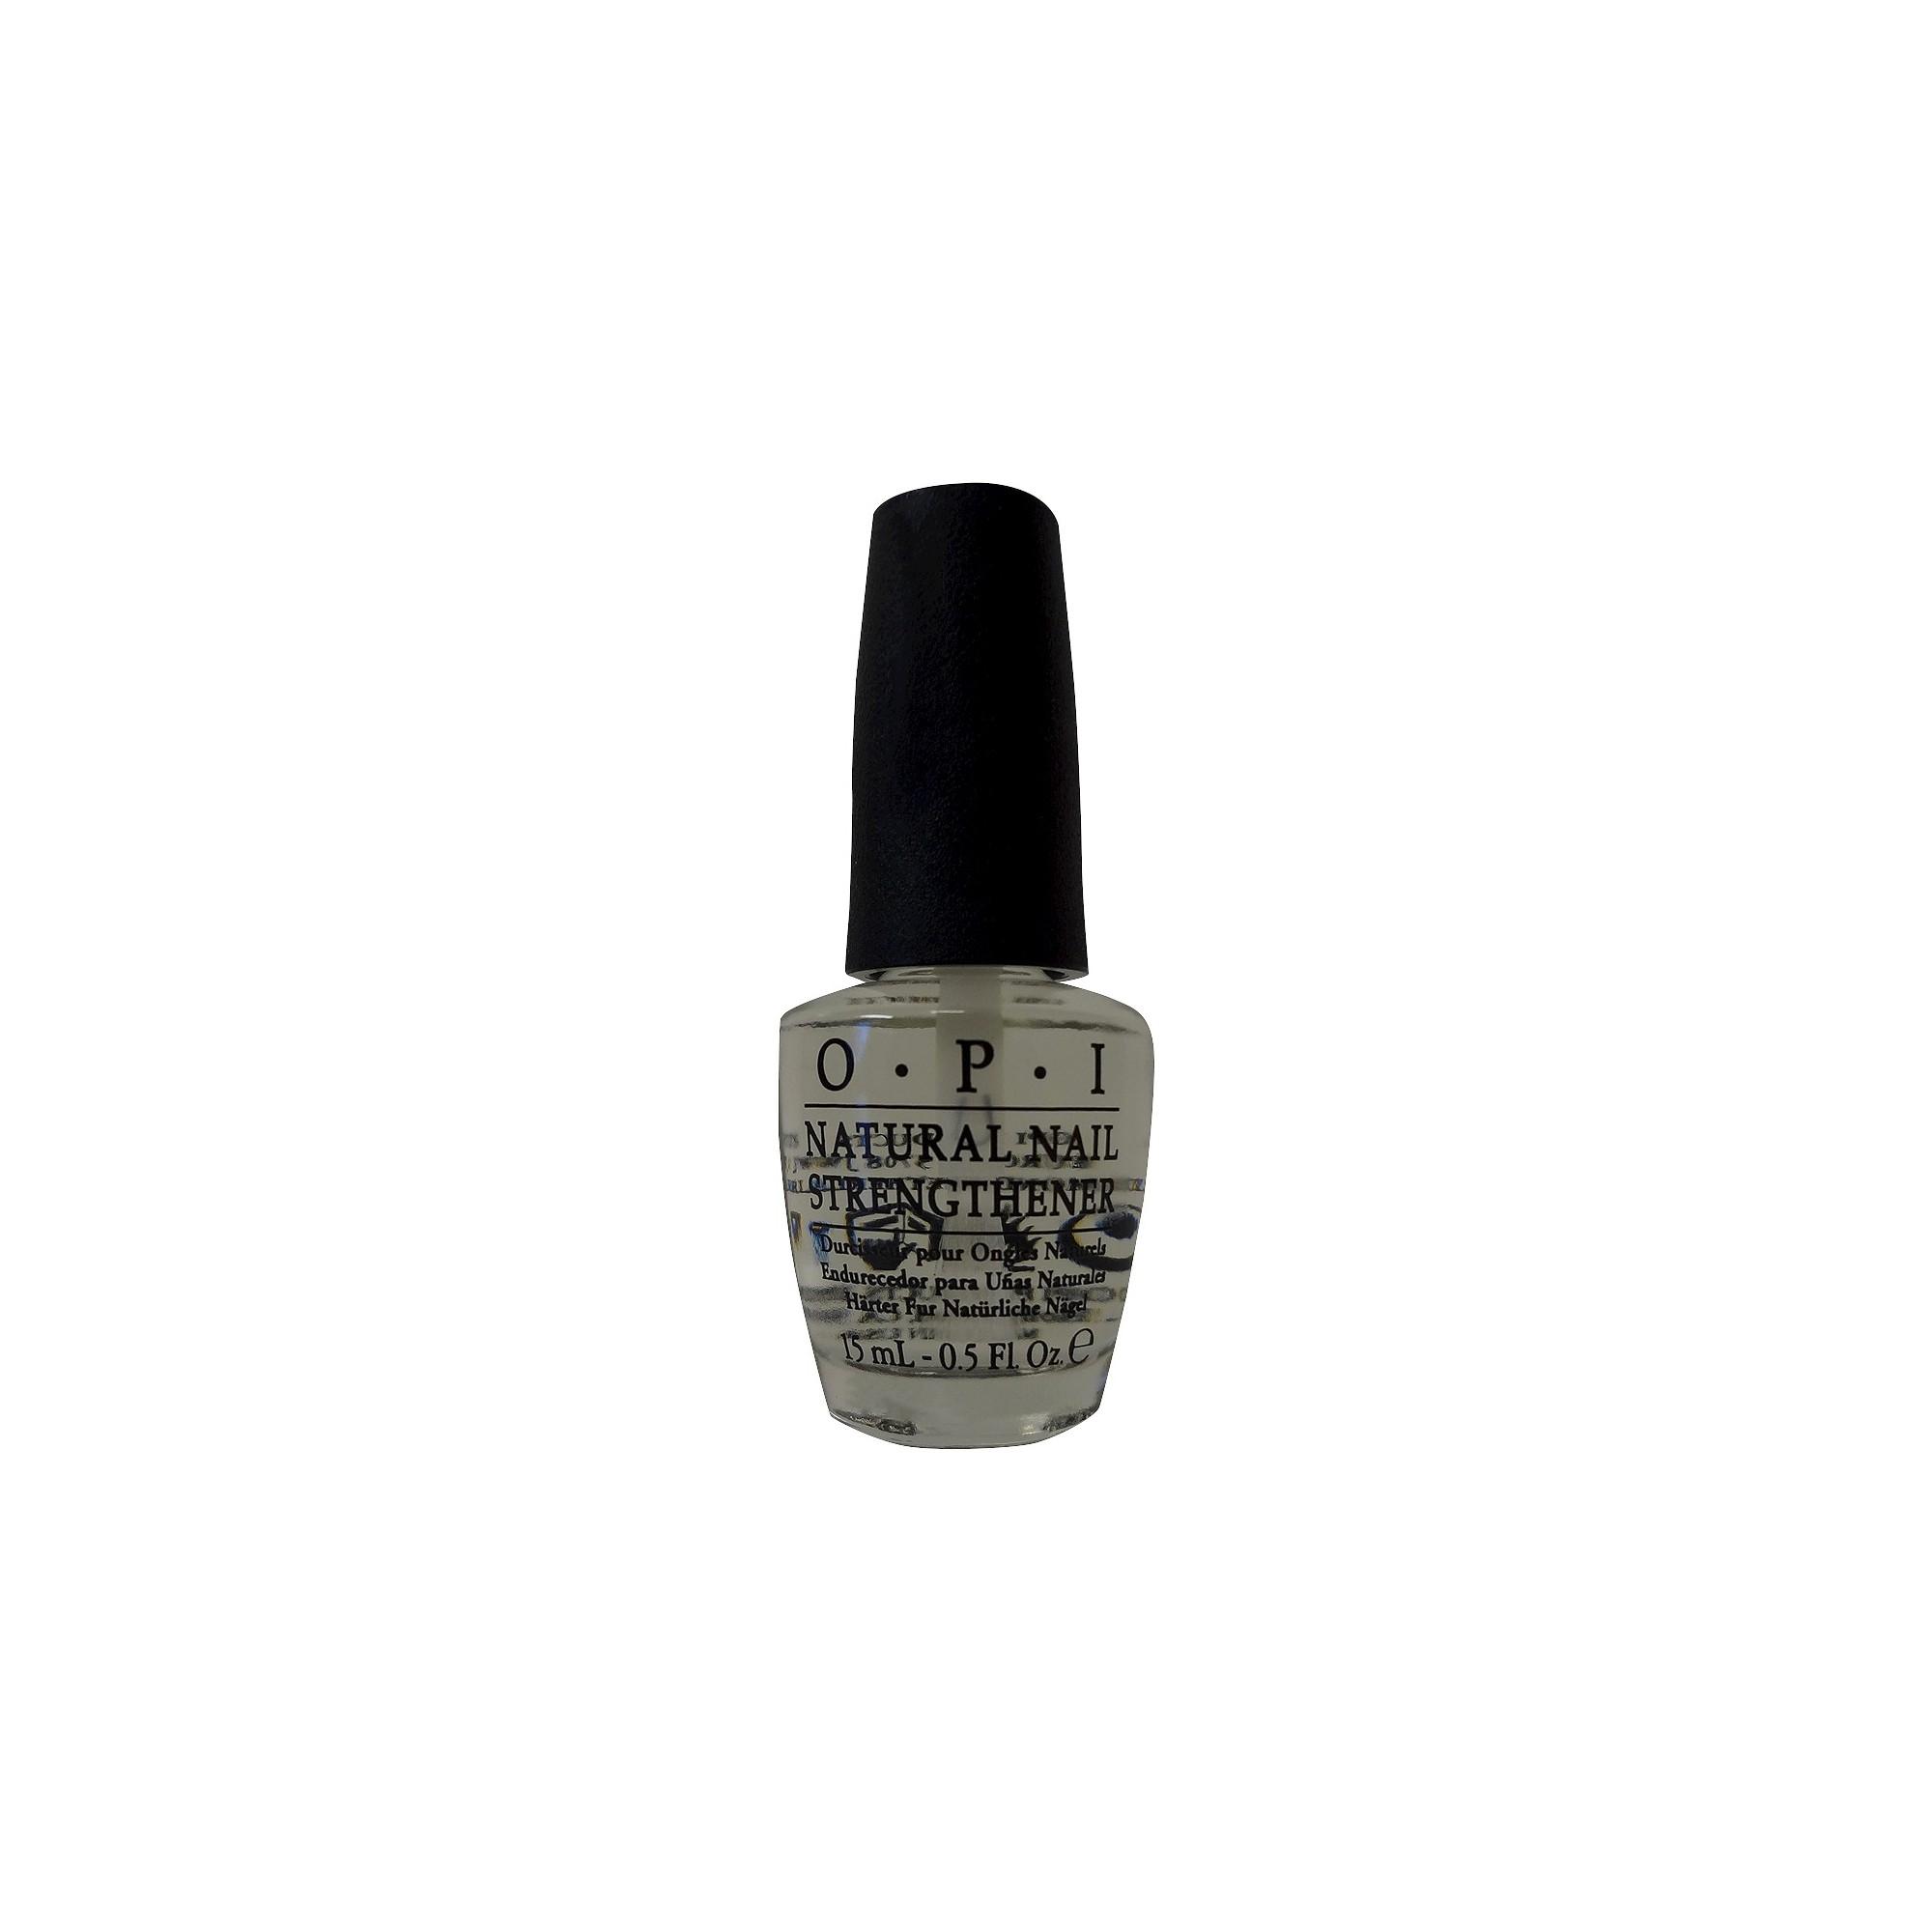 Opi Nail Lacquer - Nail Strengthener | Opi nails and Products